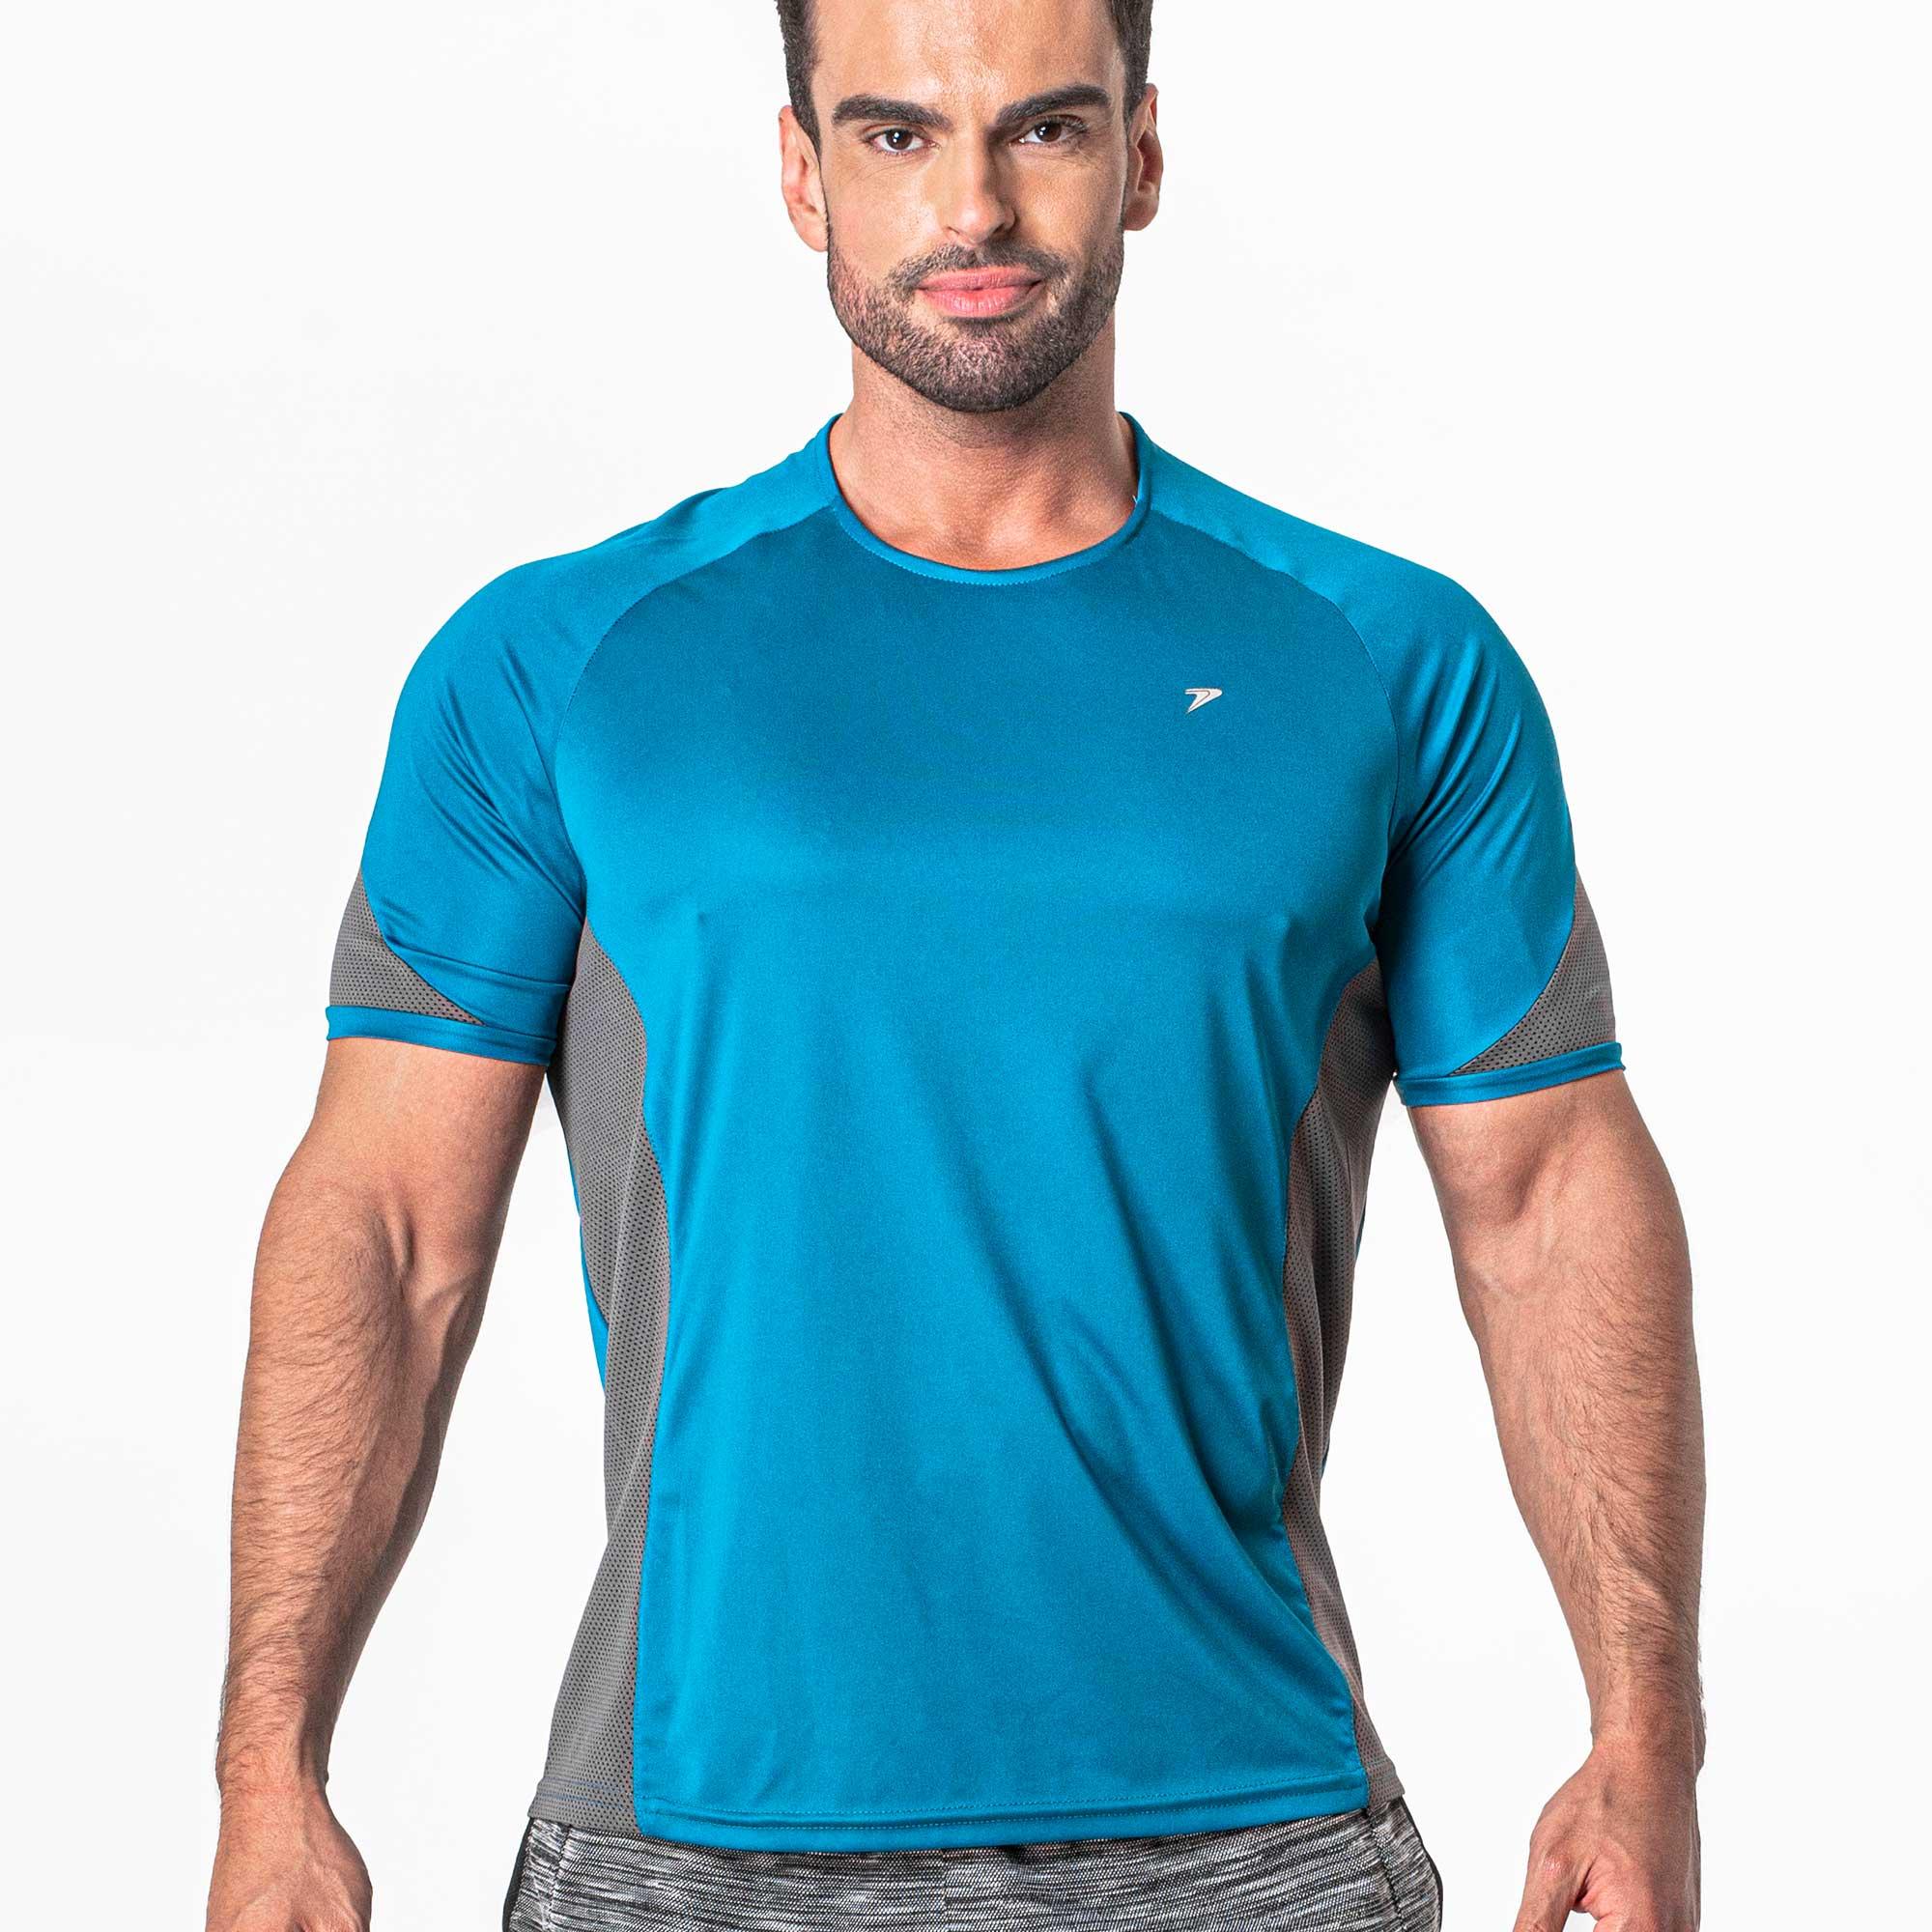 Camiseta Esportiva Fate Big Size 04267